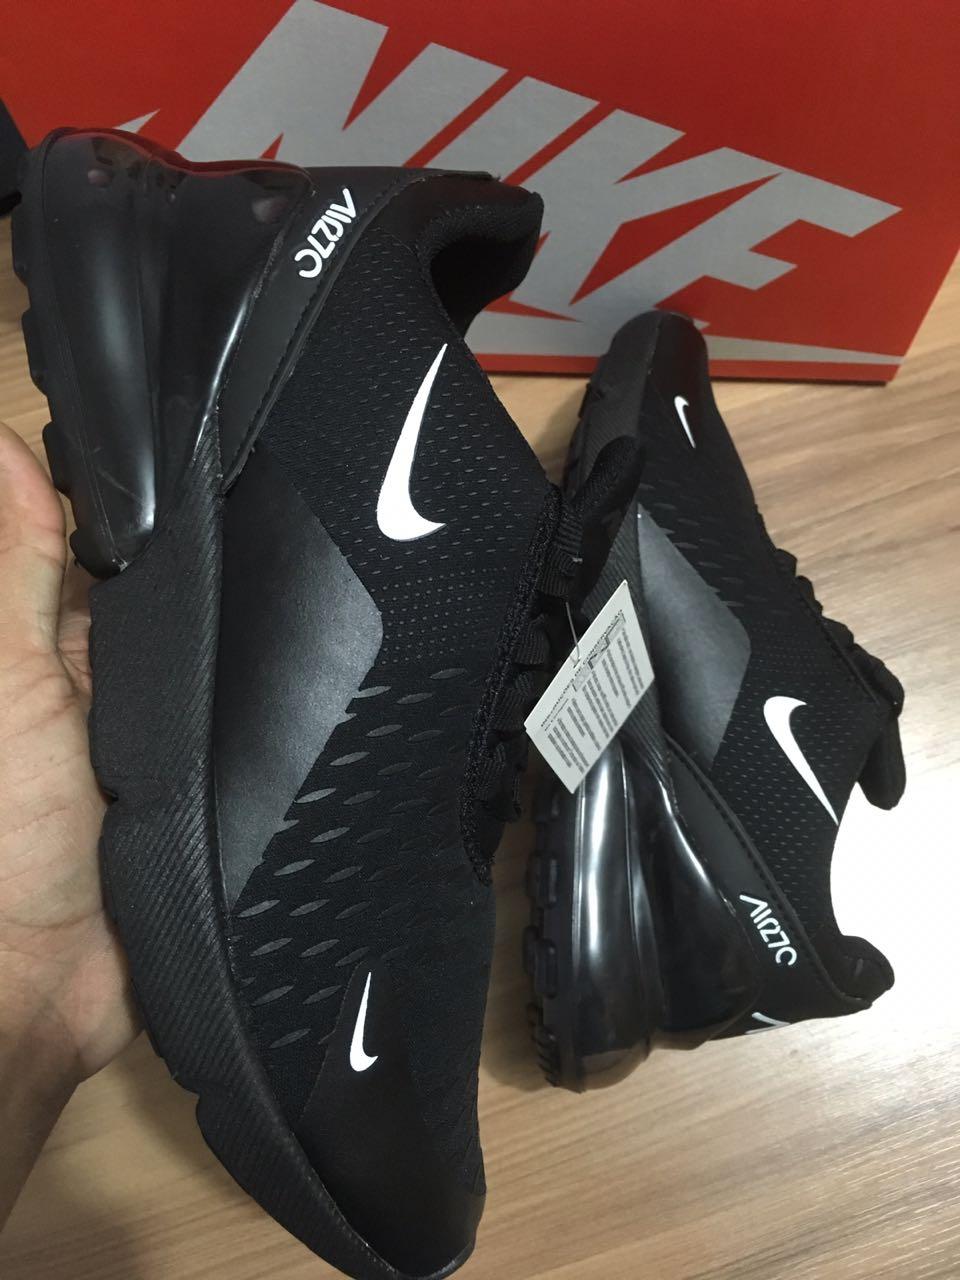 1f216d144e7 Tênis Nike Air Max 270 - LeveShoes